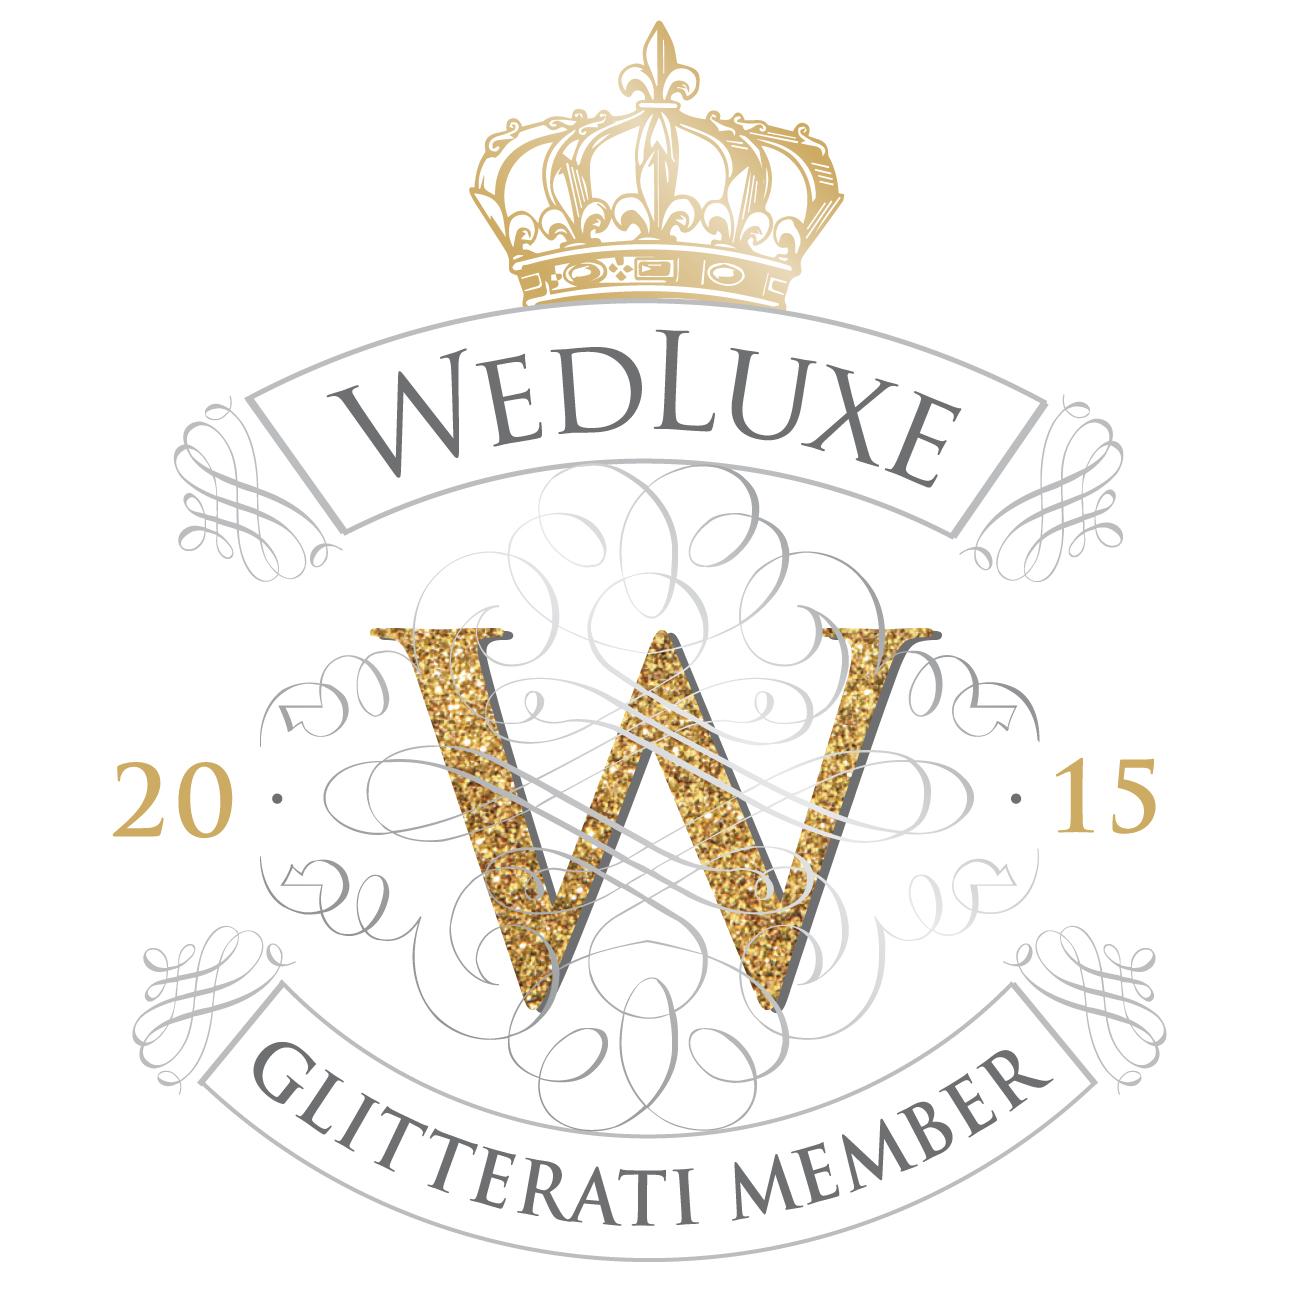 wlx-badge2015-300.jpg